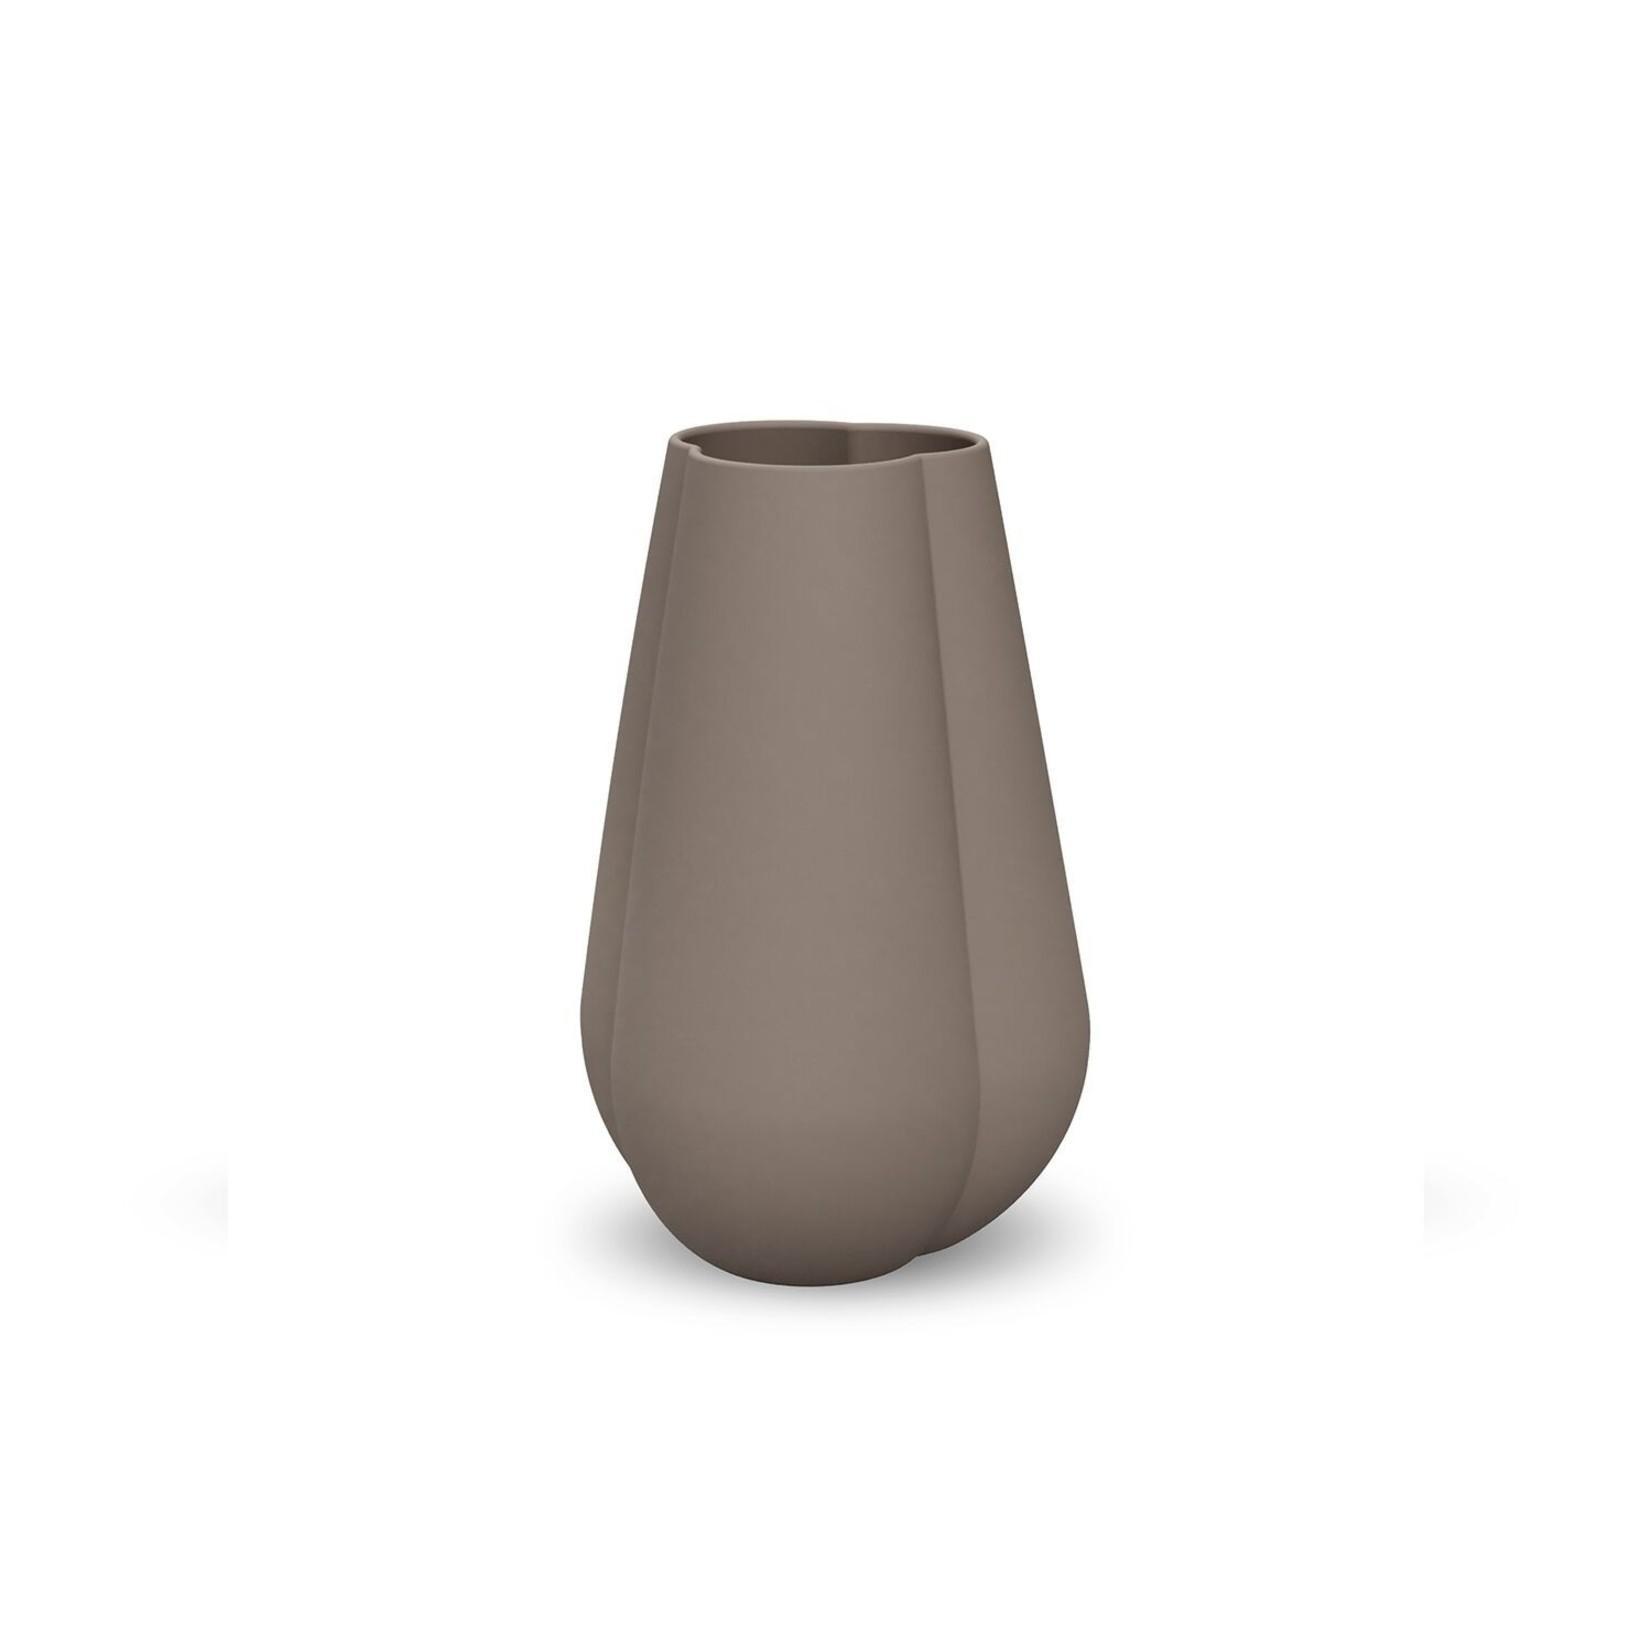 Cooee Design Clover Vase 18cm Mud